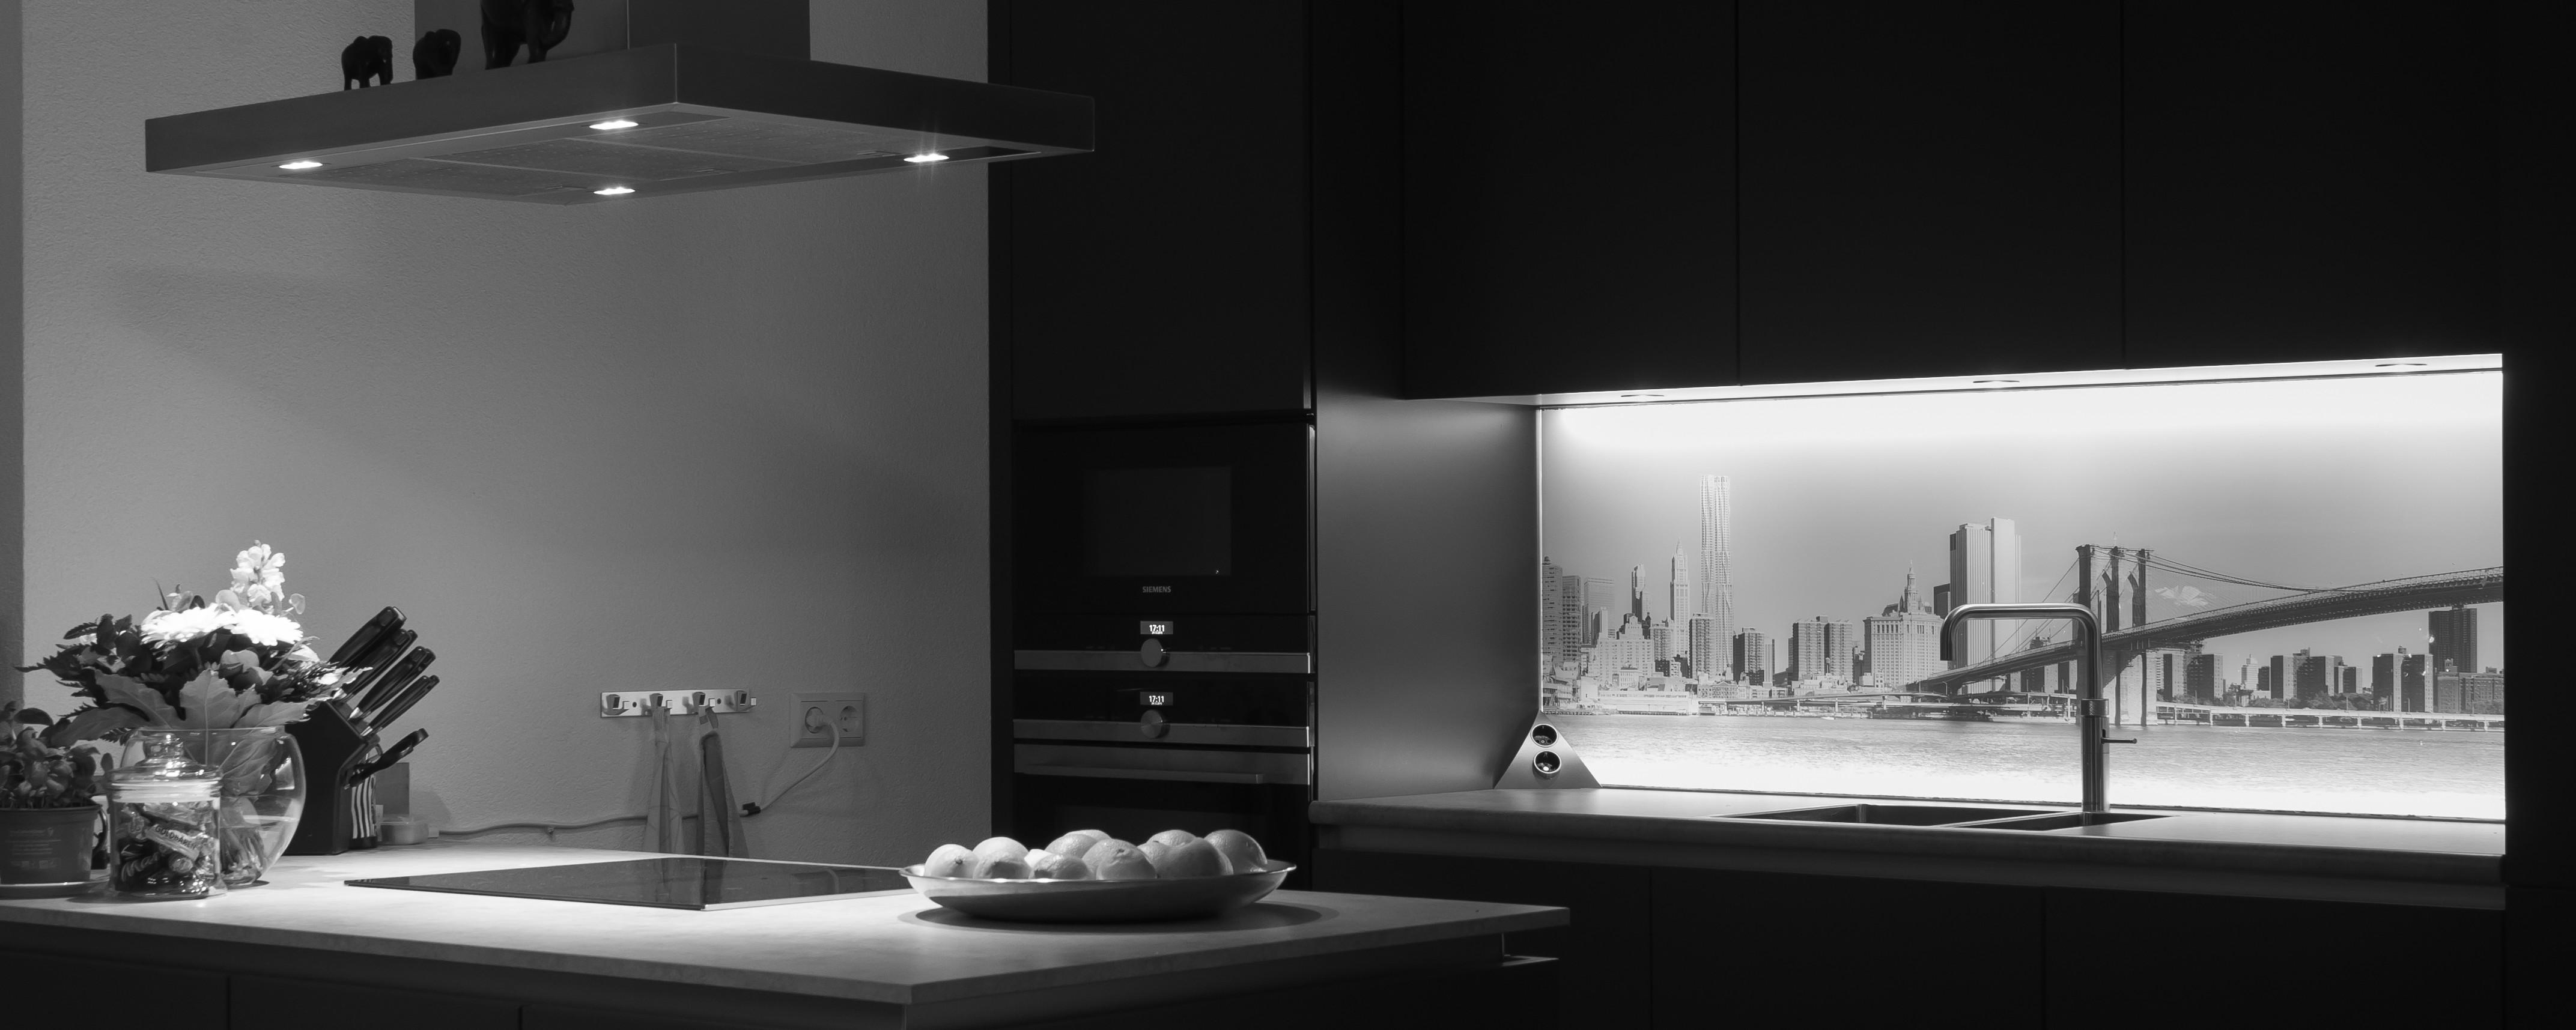 Nieuwe achterwand keuken glasatelier edelglas for Keuken met glas